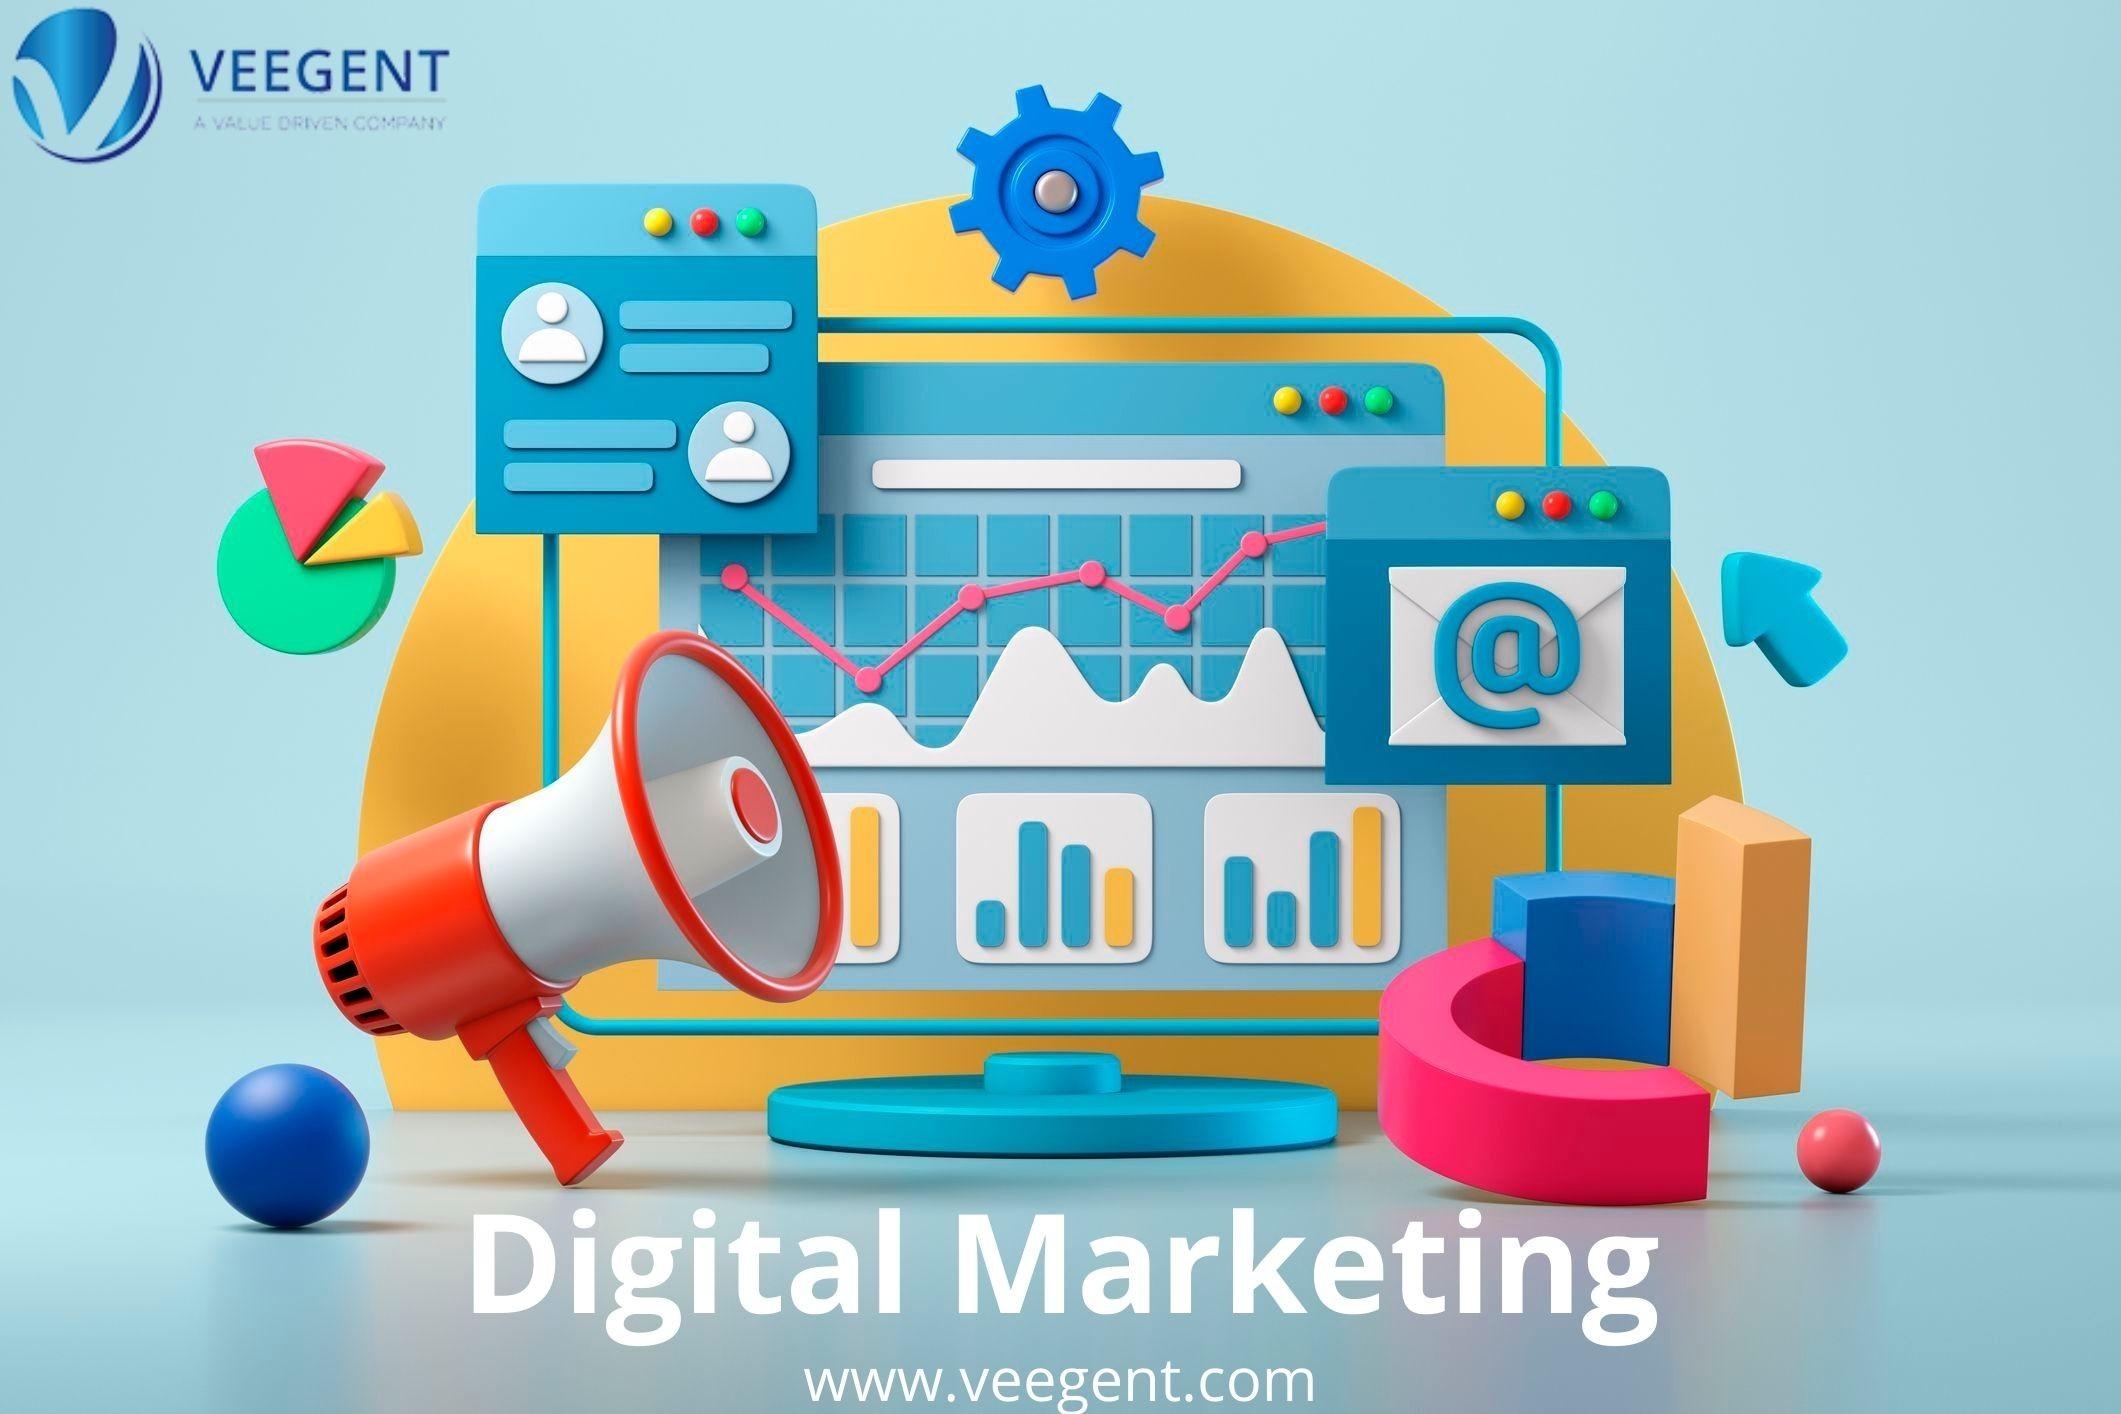 Digital Marketing Agency | Digital Marketing Services in Pune - Veegent